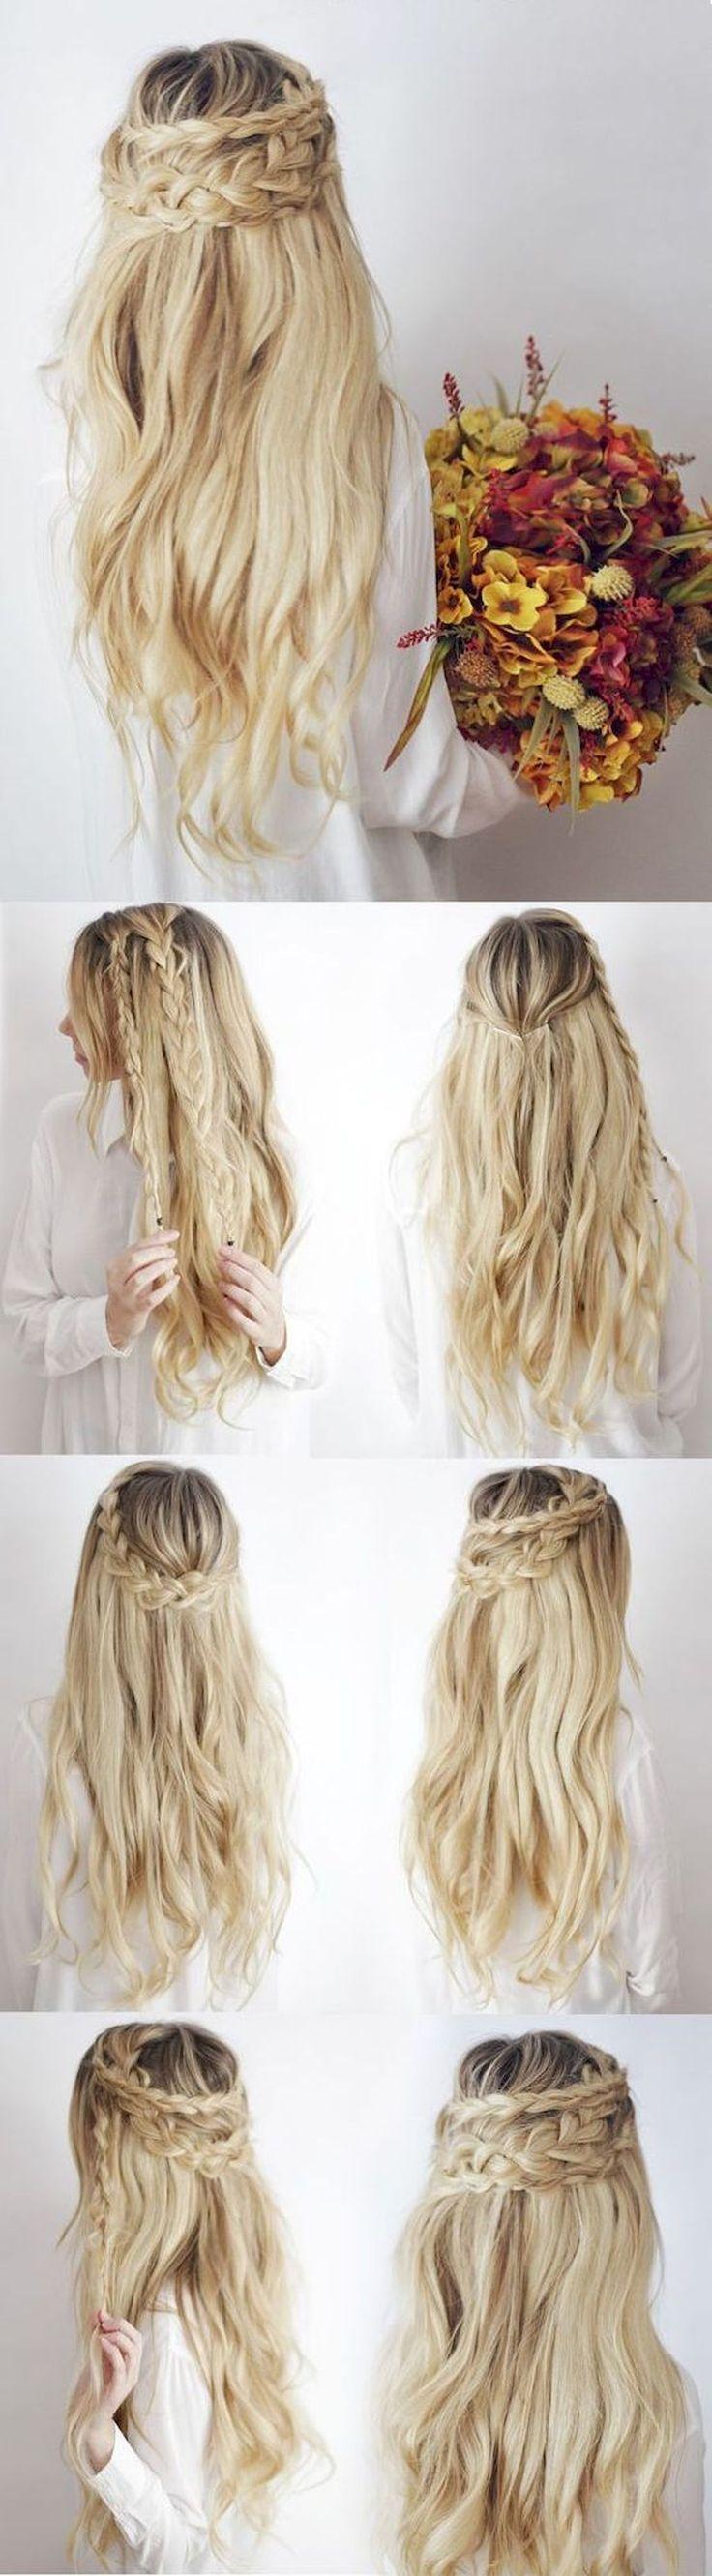 173 best Art Designs Ideas images on Pinterest   Hairstyle ideas ...